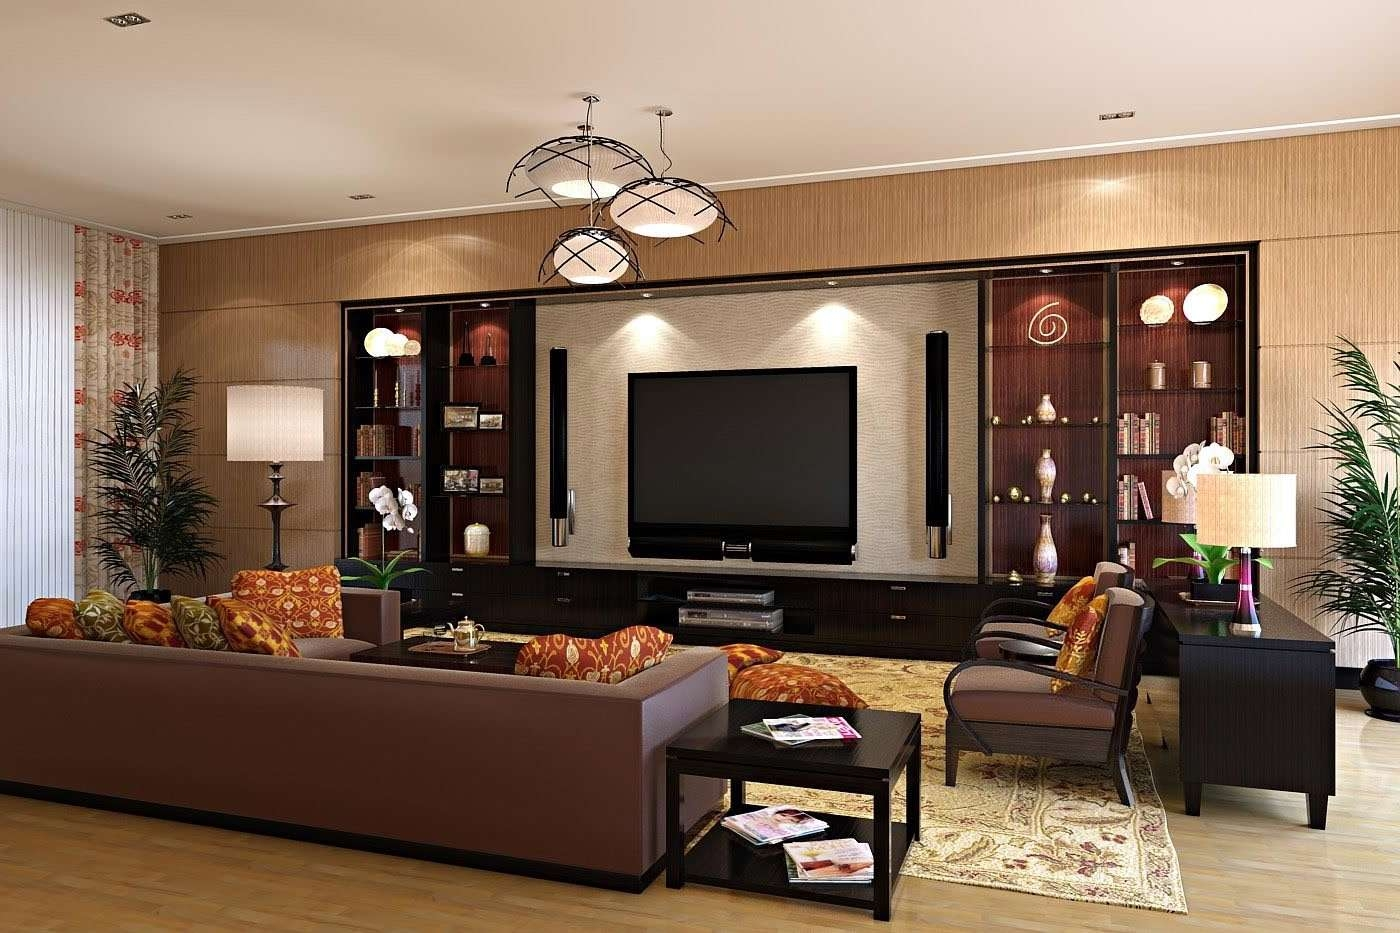 Big Tv Cabinet Amazing Home Design Contemporary And Big Tv Cabinet In Big Tv Cabinets (View 13 of 20)